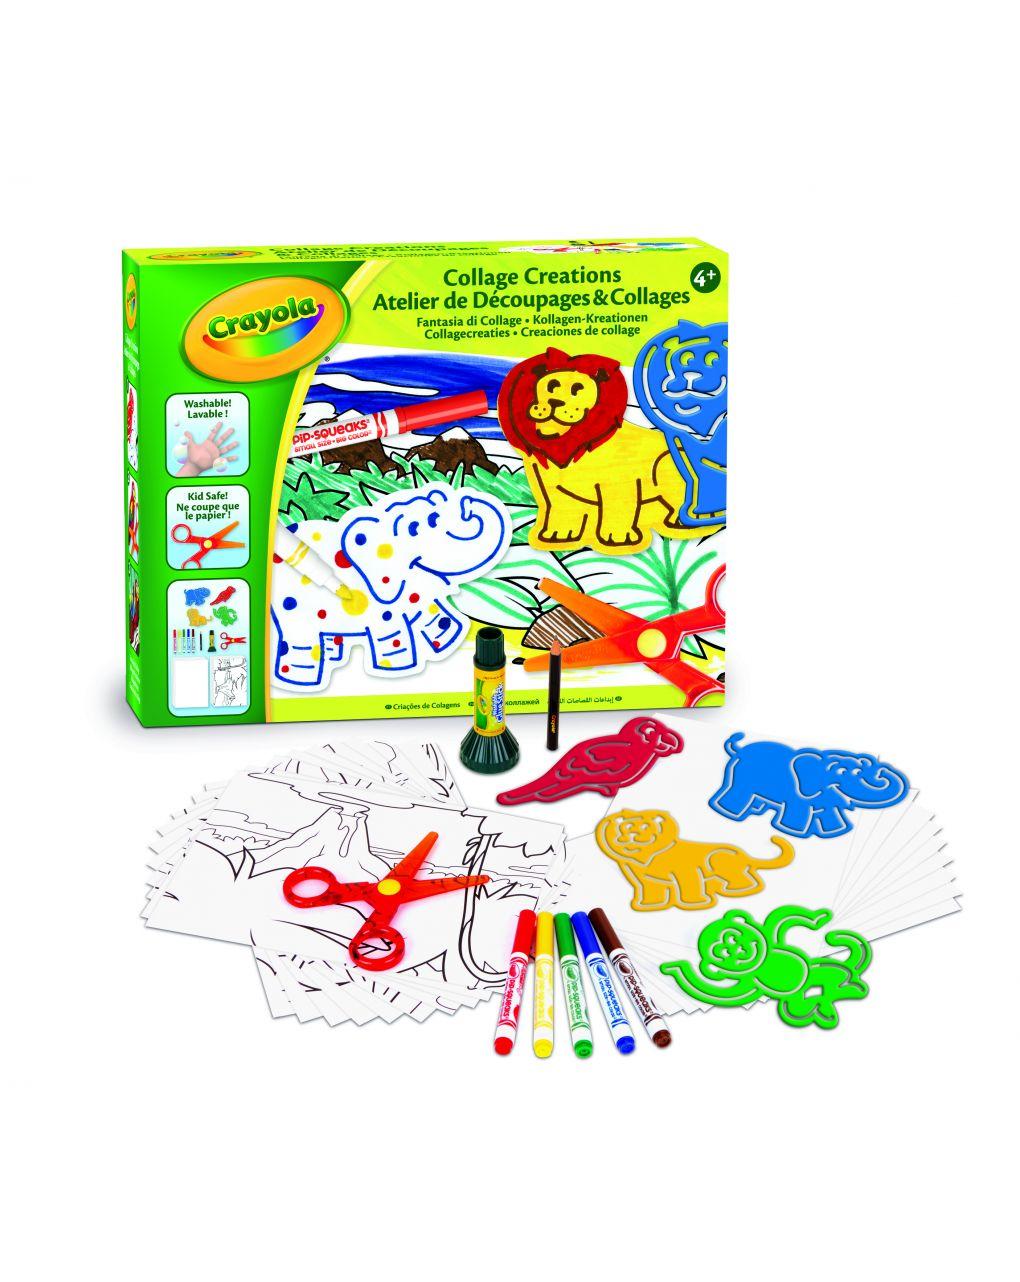 Crayola - fantasia de colagem - Crayola